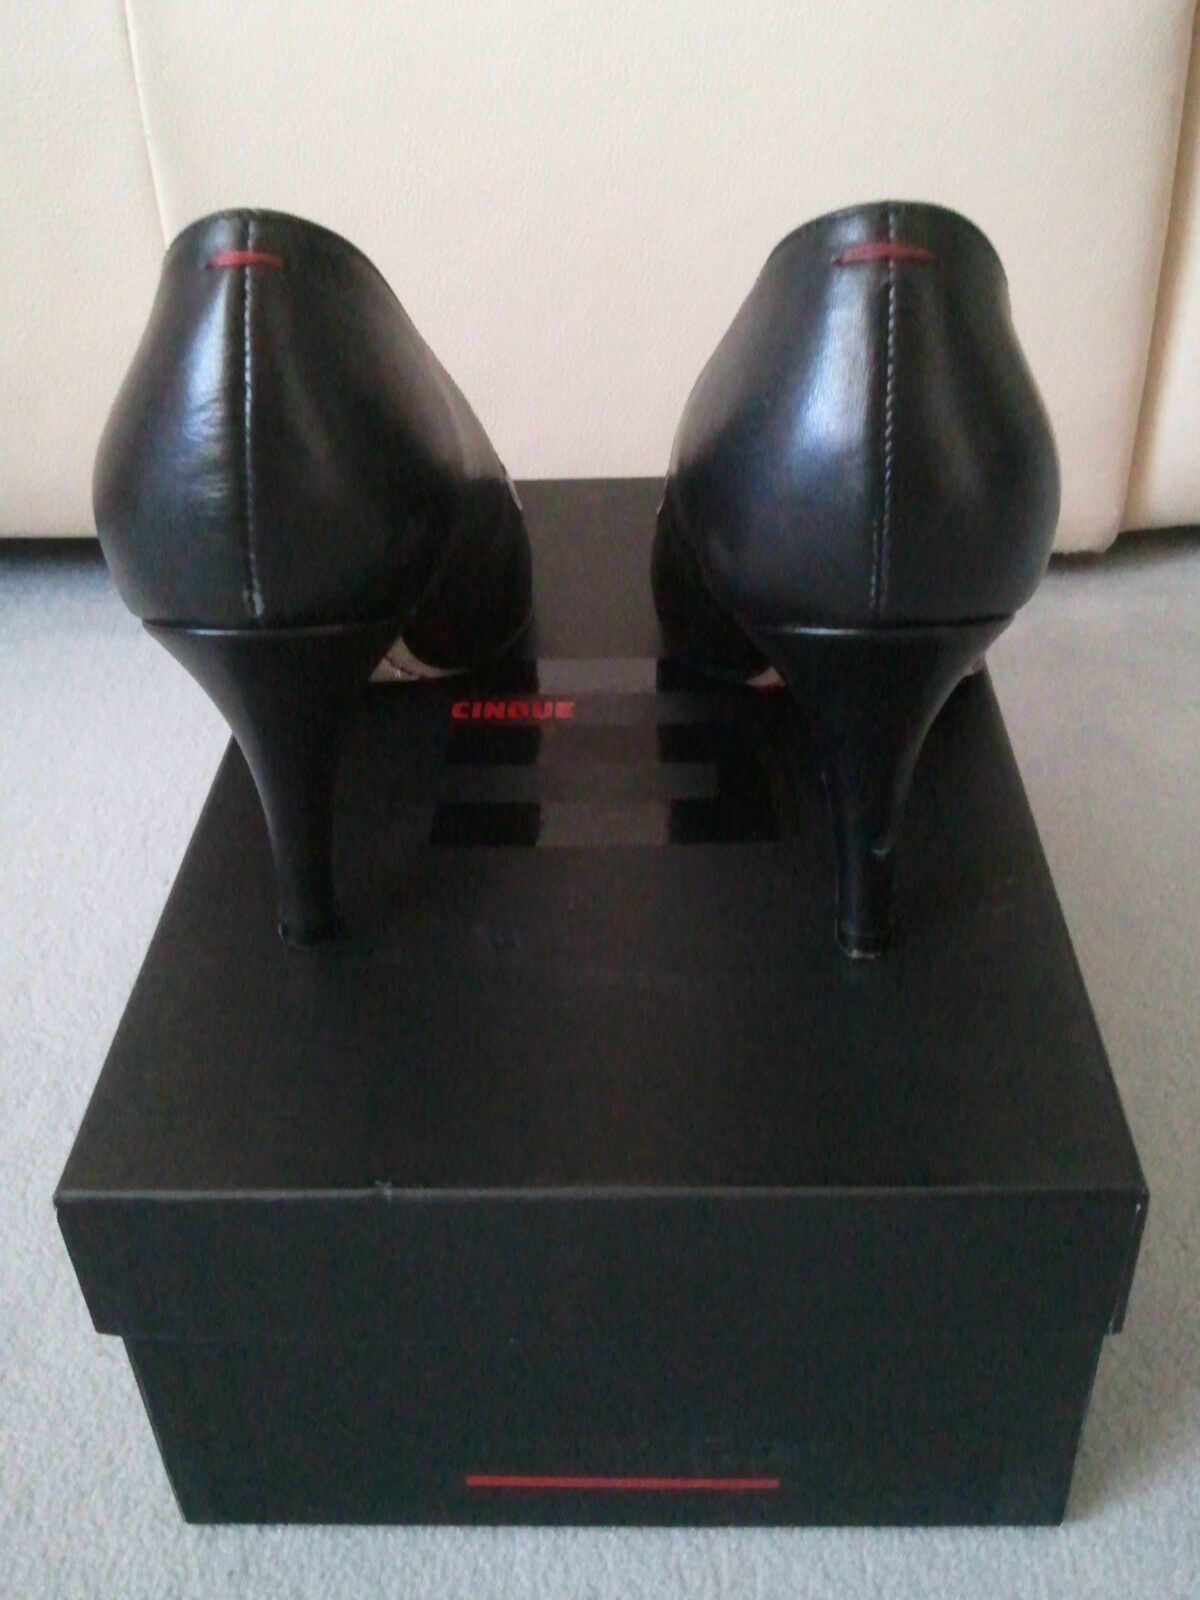 CINQUE Pumps CITONI, CITONI, CITONI, Größe 38, schwarz a56661